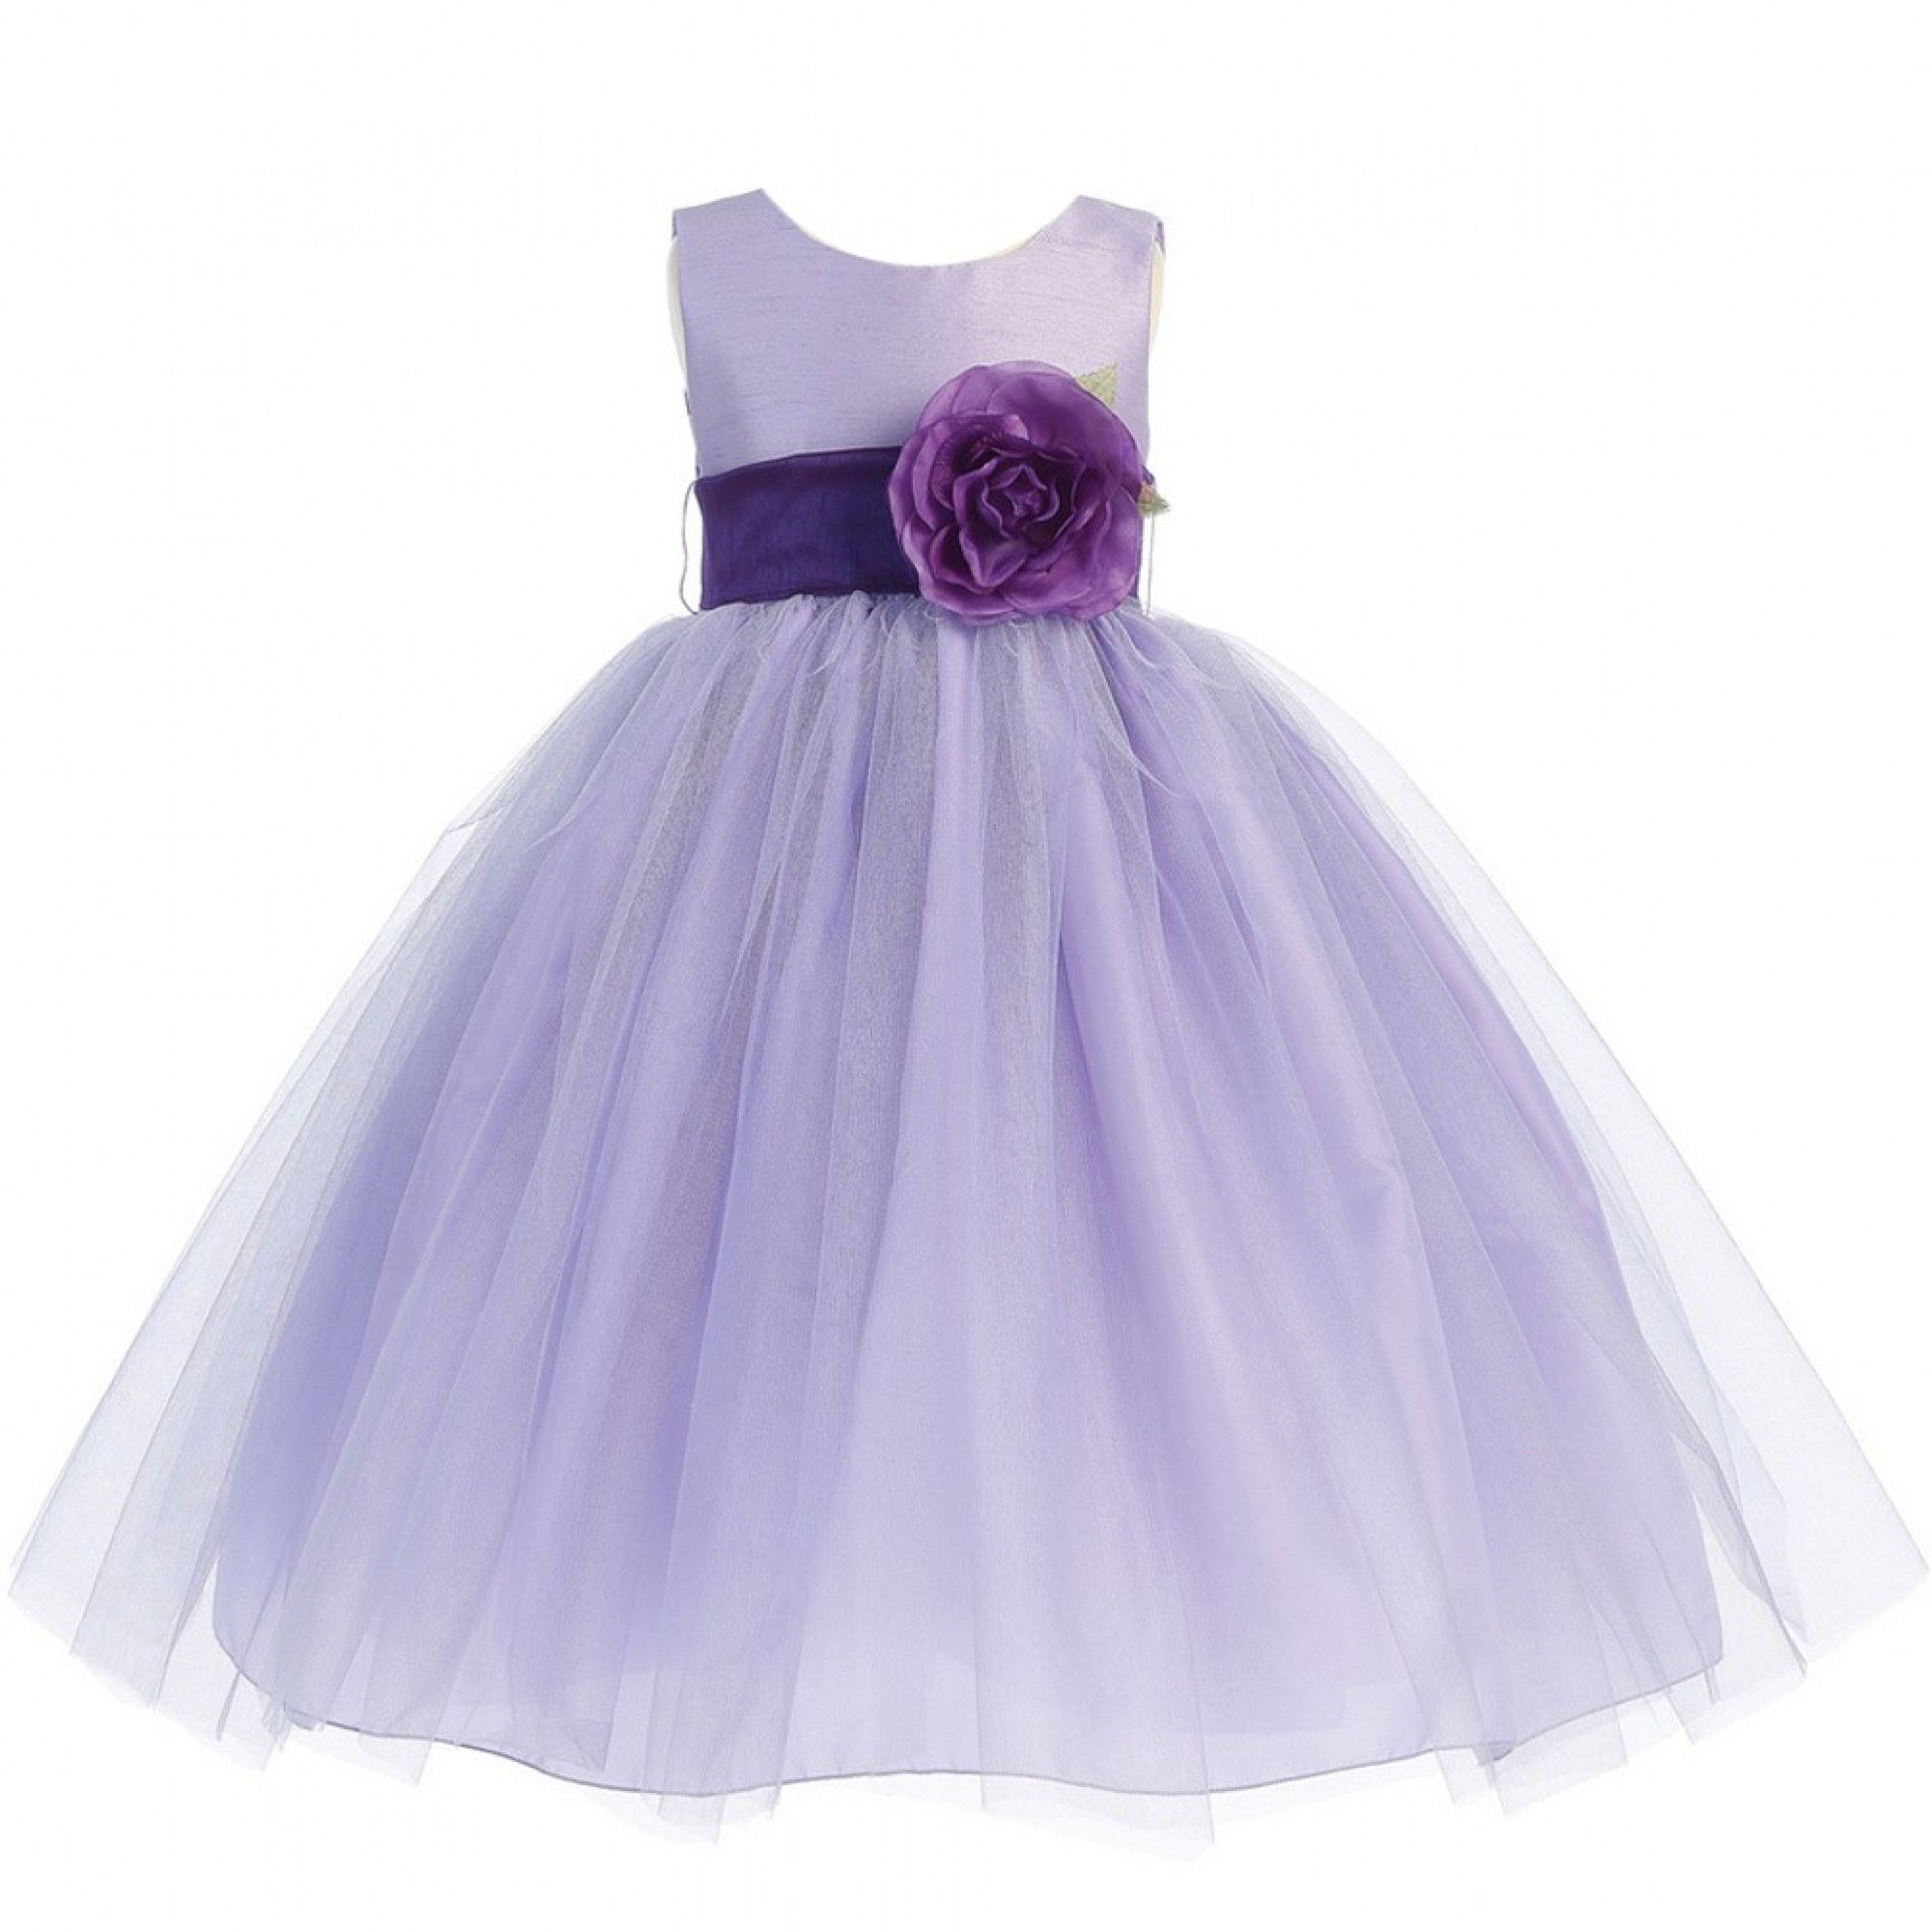 Lito big girls lilac purple sash poly silk tulle flower girl dress 7 lito big girls lilac purple sash poly silk tulle flower girl dress 7 12 ombrellifo Gallery